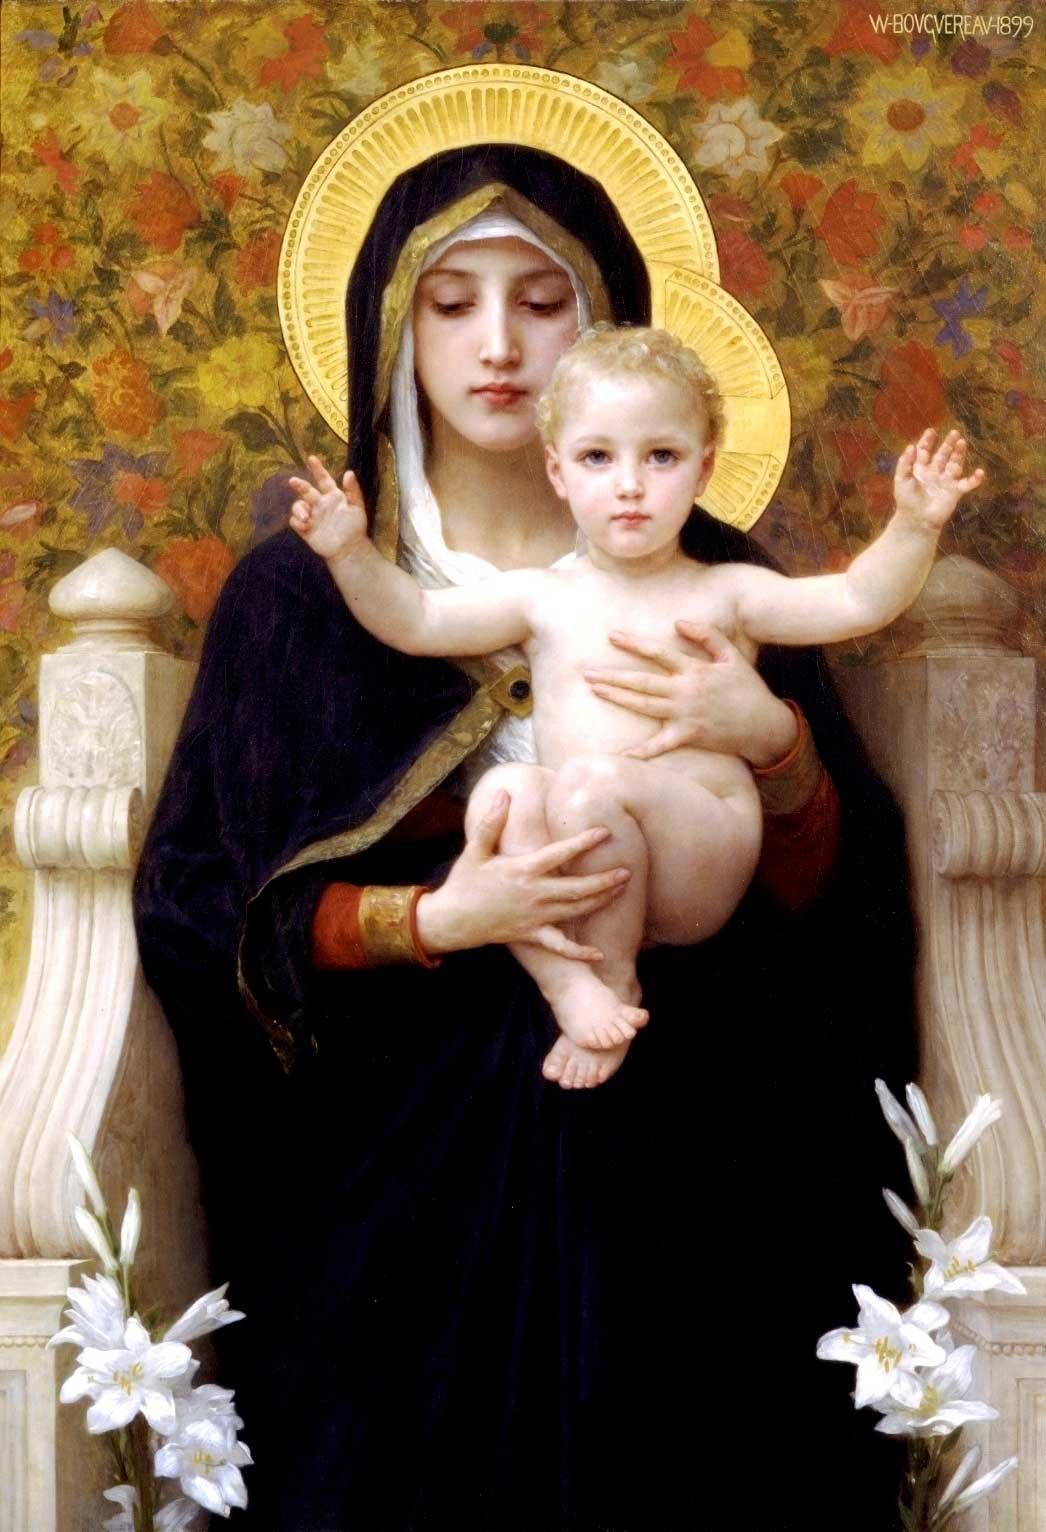 William Bouguereau (1825-1905): La Vierge au lys («Jomfruen av liljene») (1899), Museum of the Art Renewal Center (ARC)